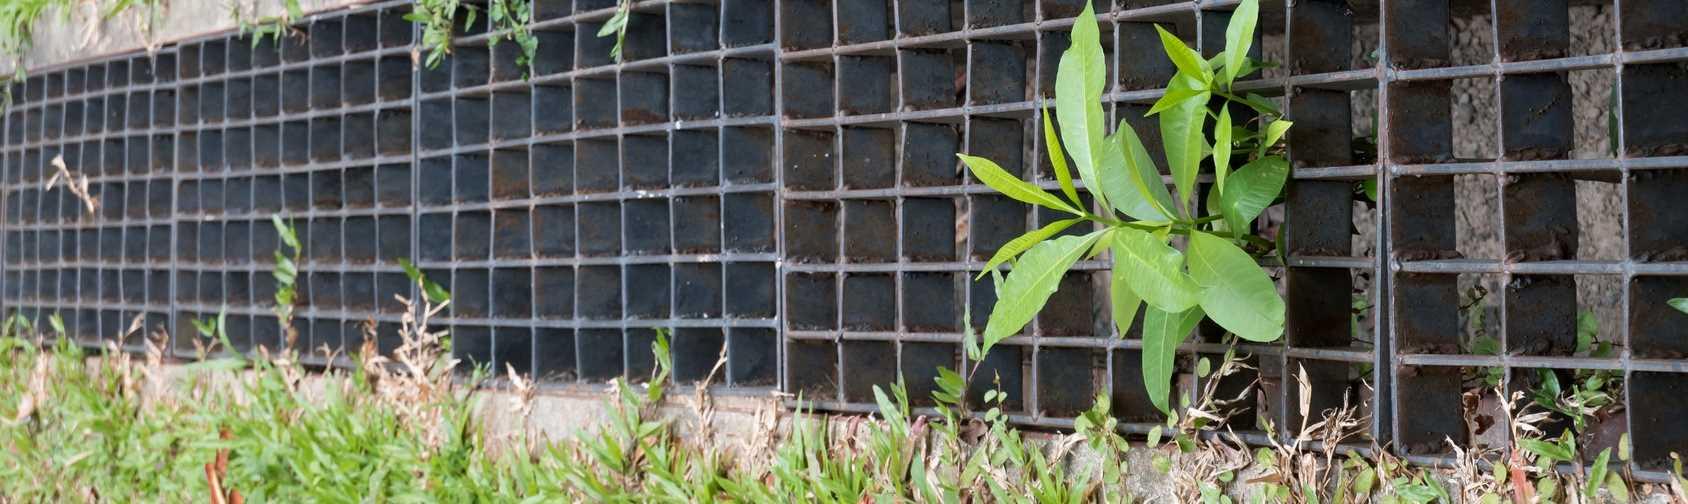 Yard Drainage Systems - Springfield MO